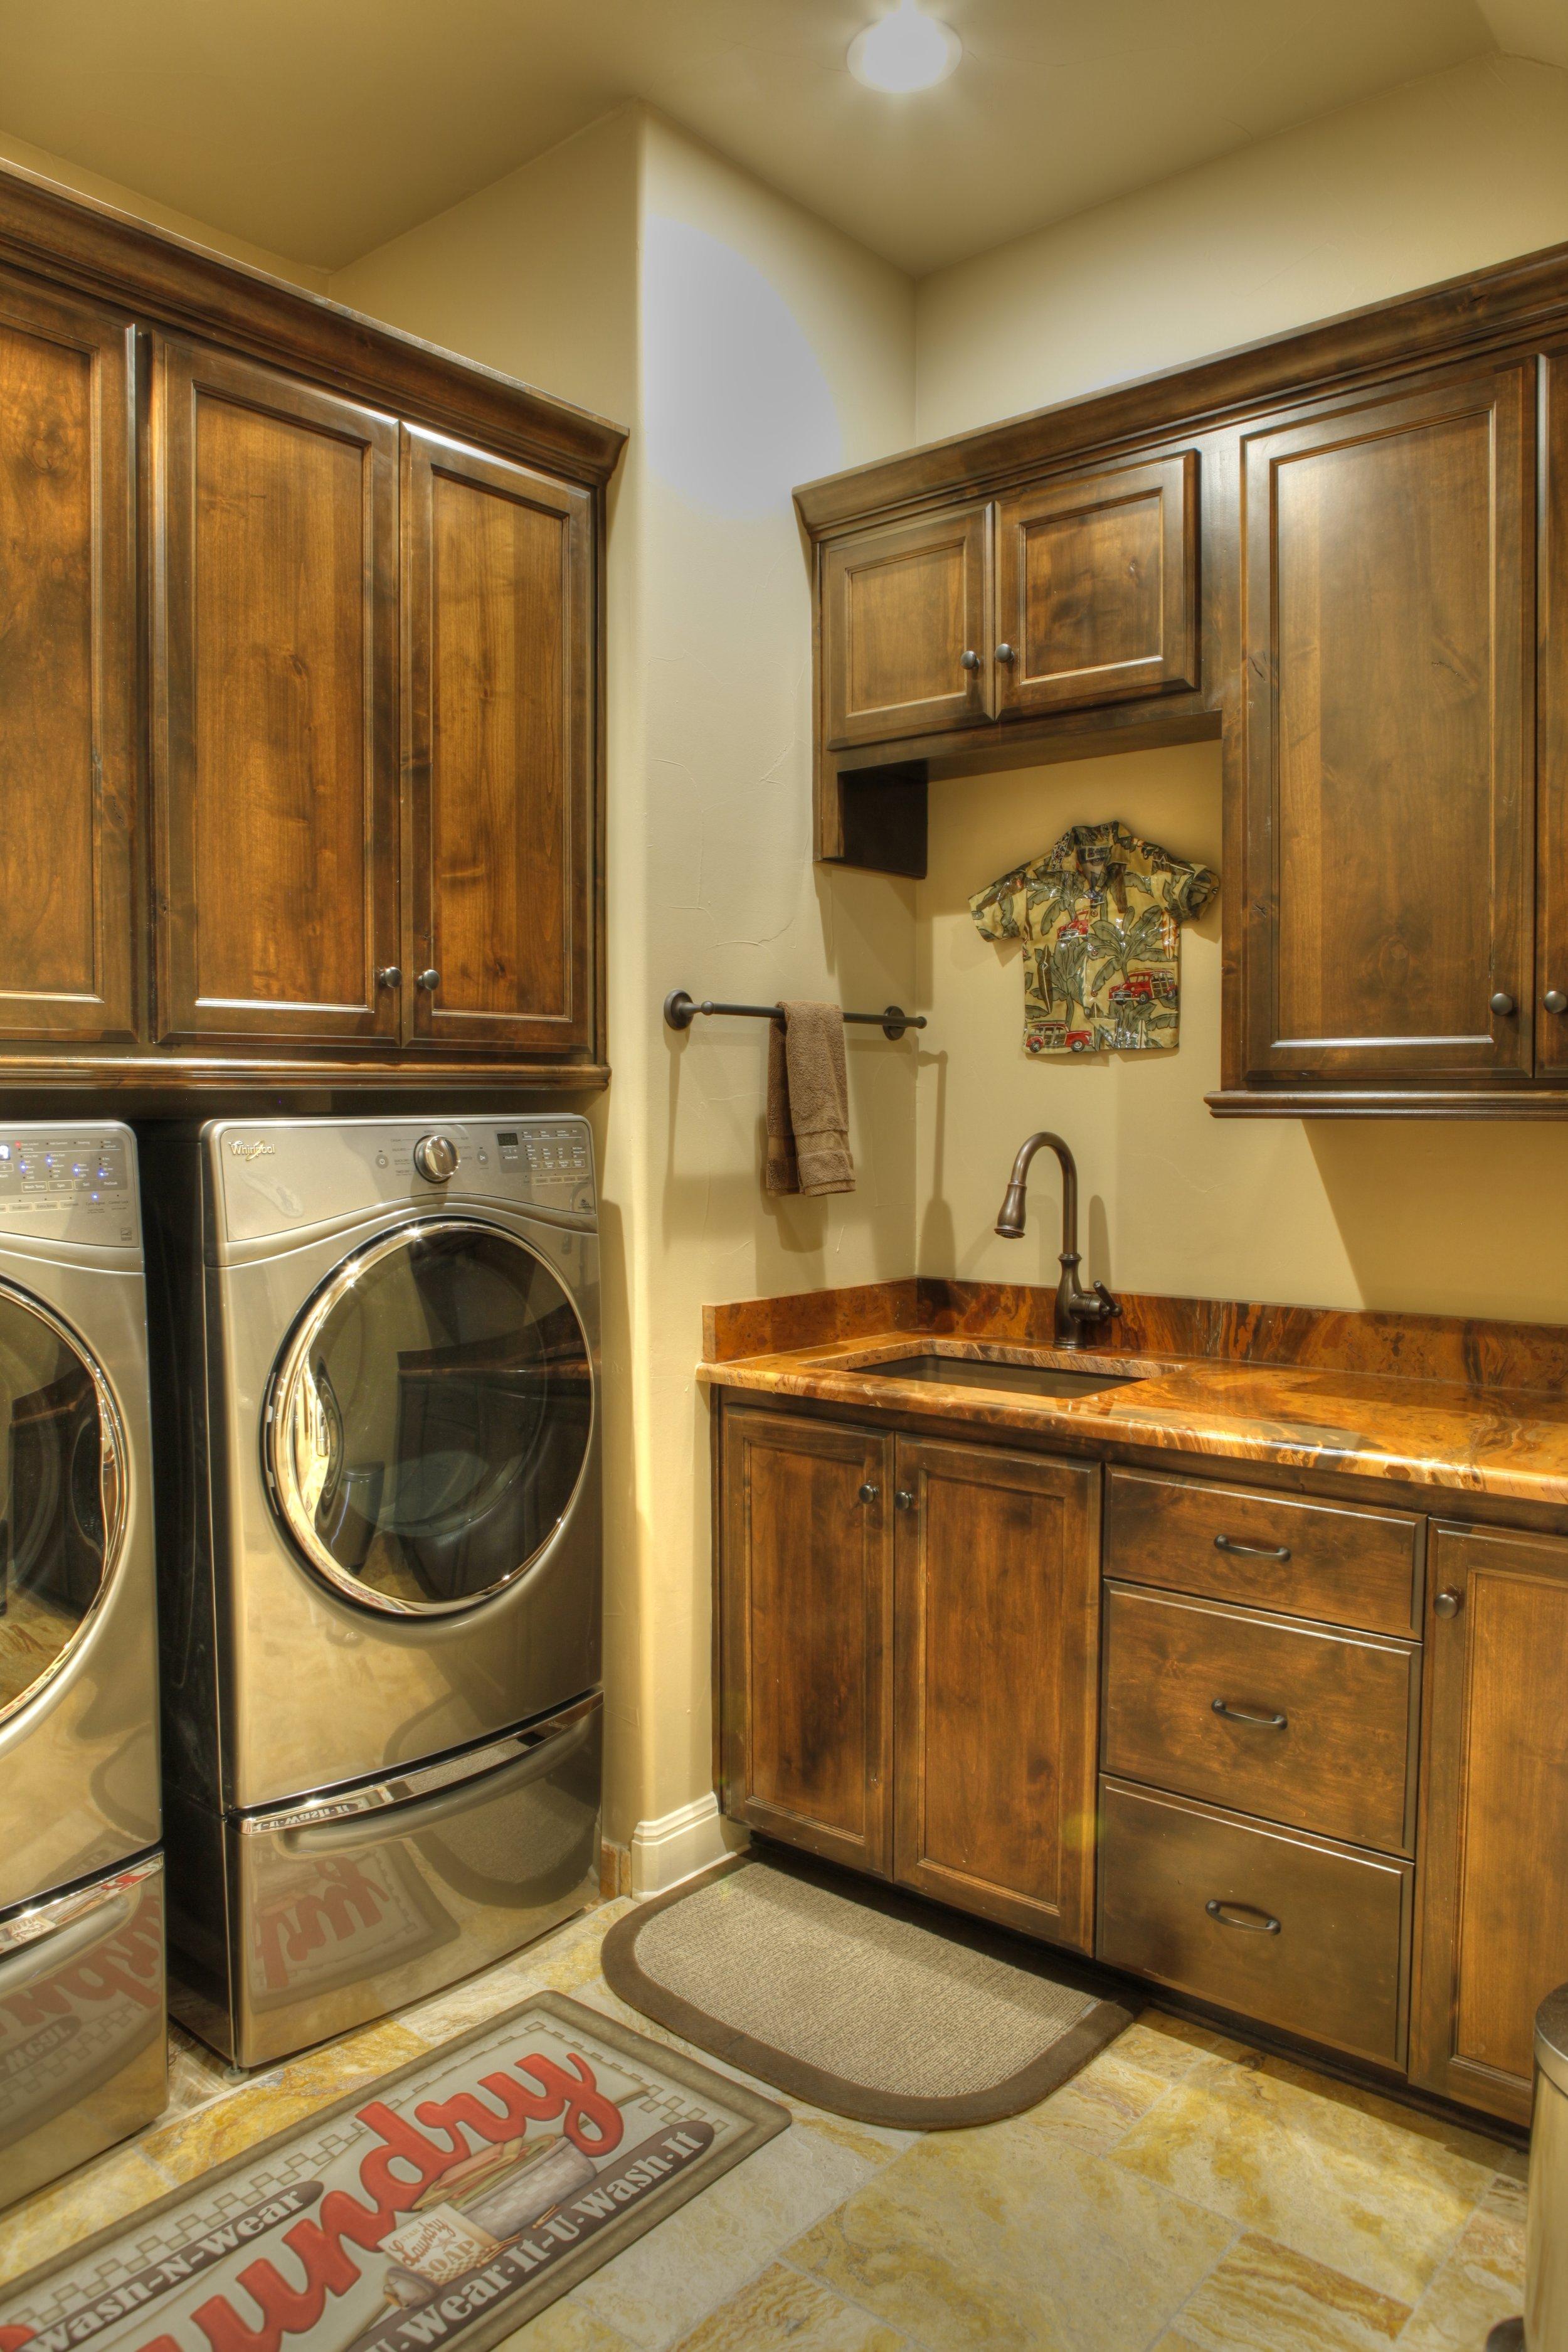 16-laundry room 1-hdr.jpg